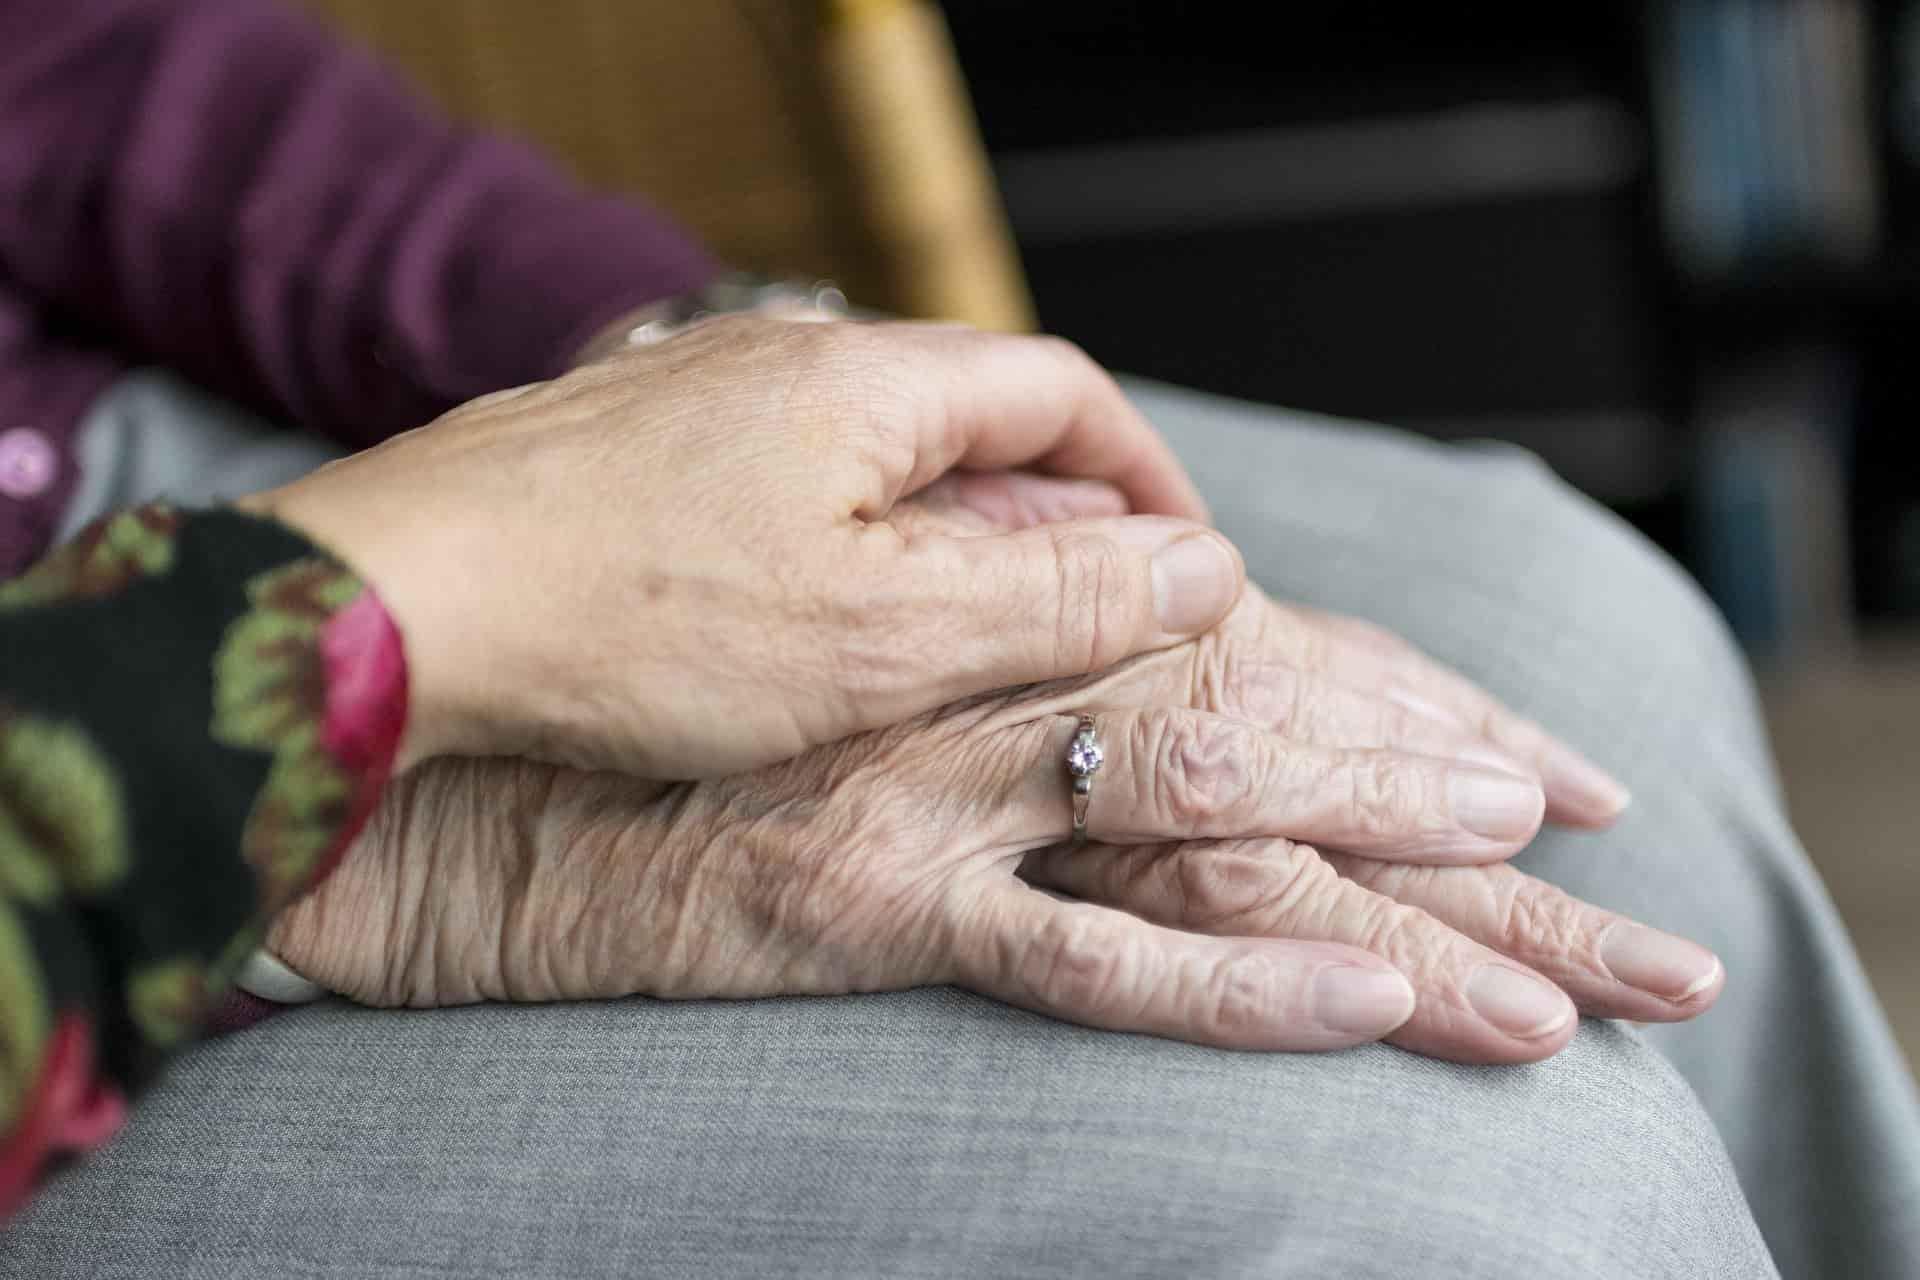 choroba Parkinsona, stare ręce